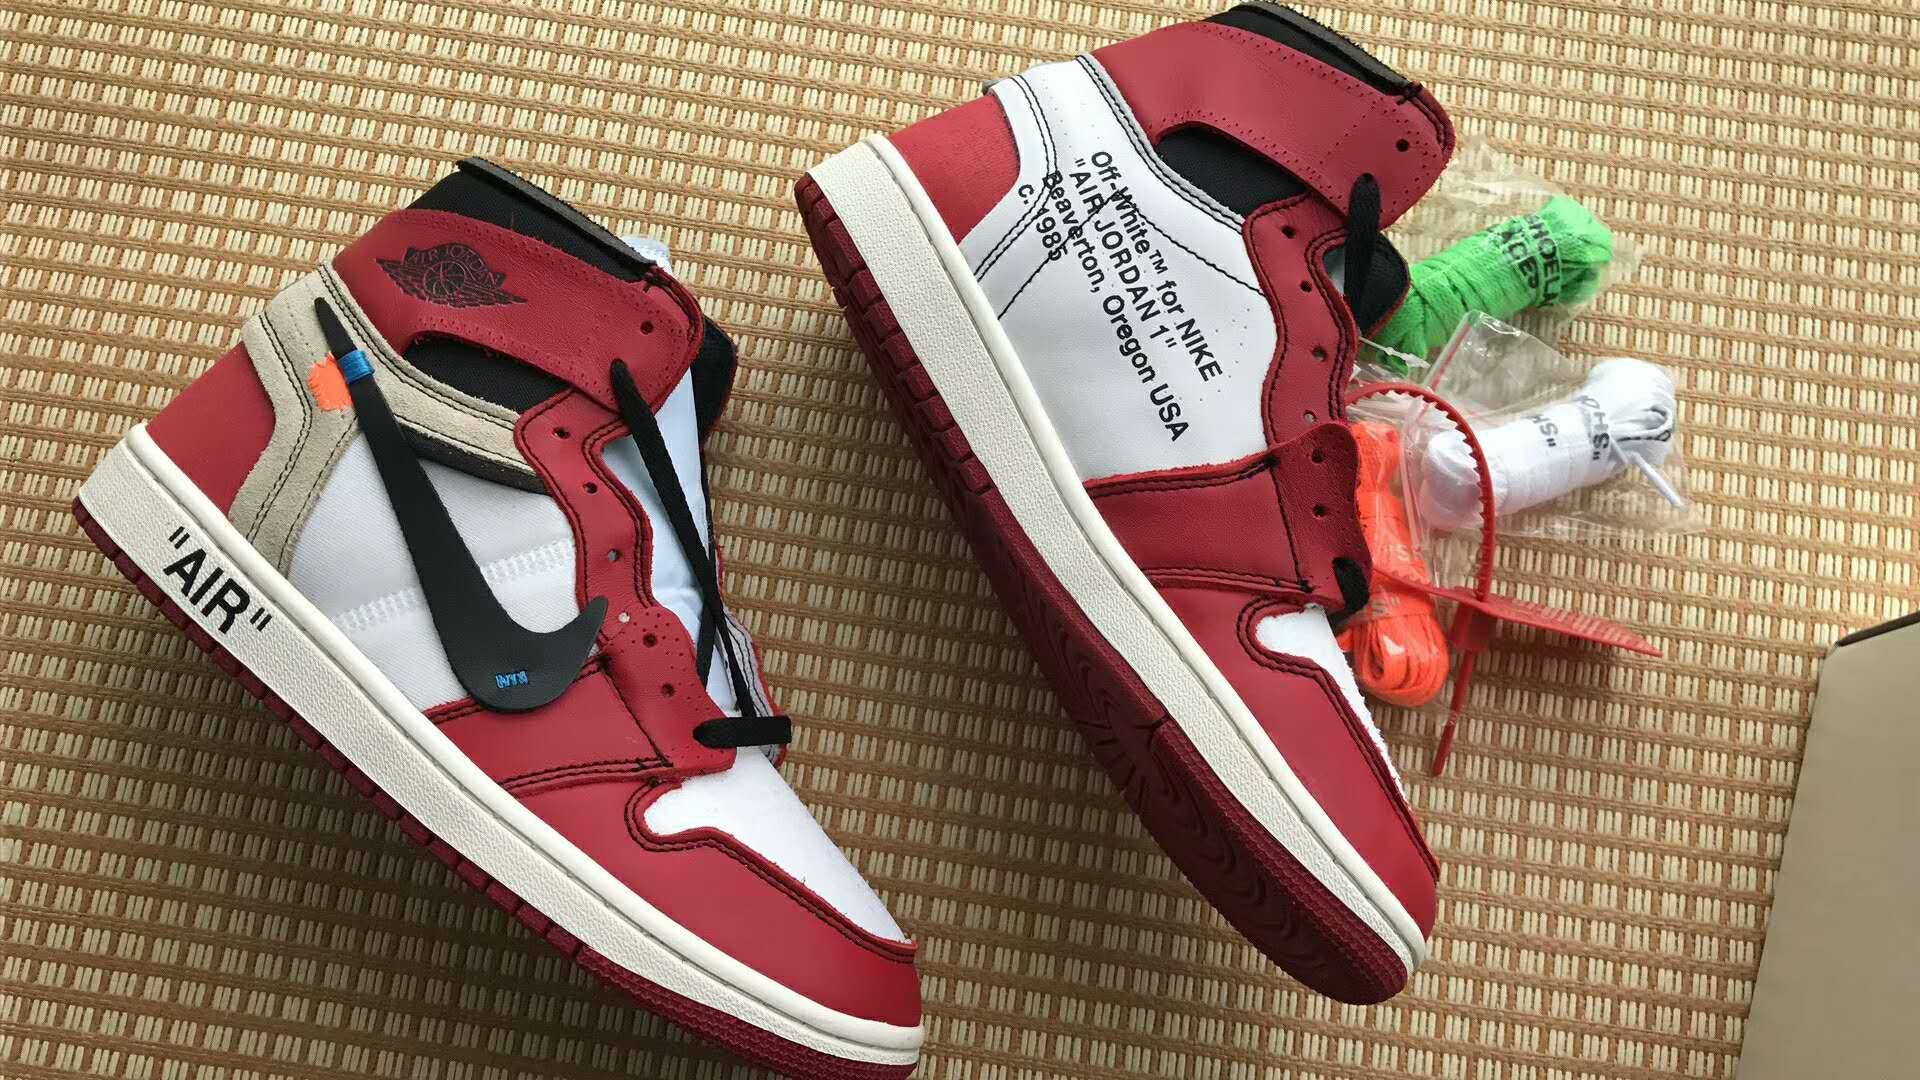 Virgil Abloh S Off White Nike Air Jordan 1 With Images Air